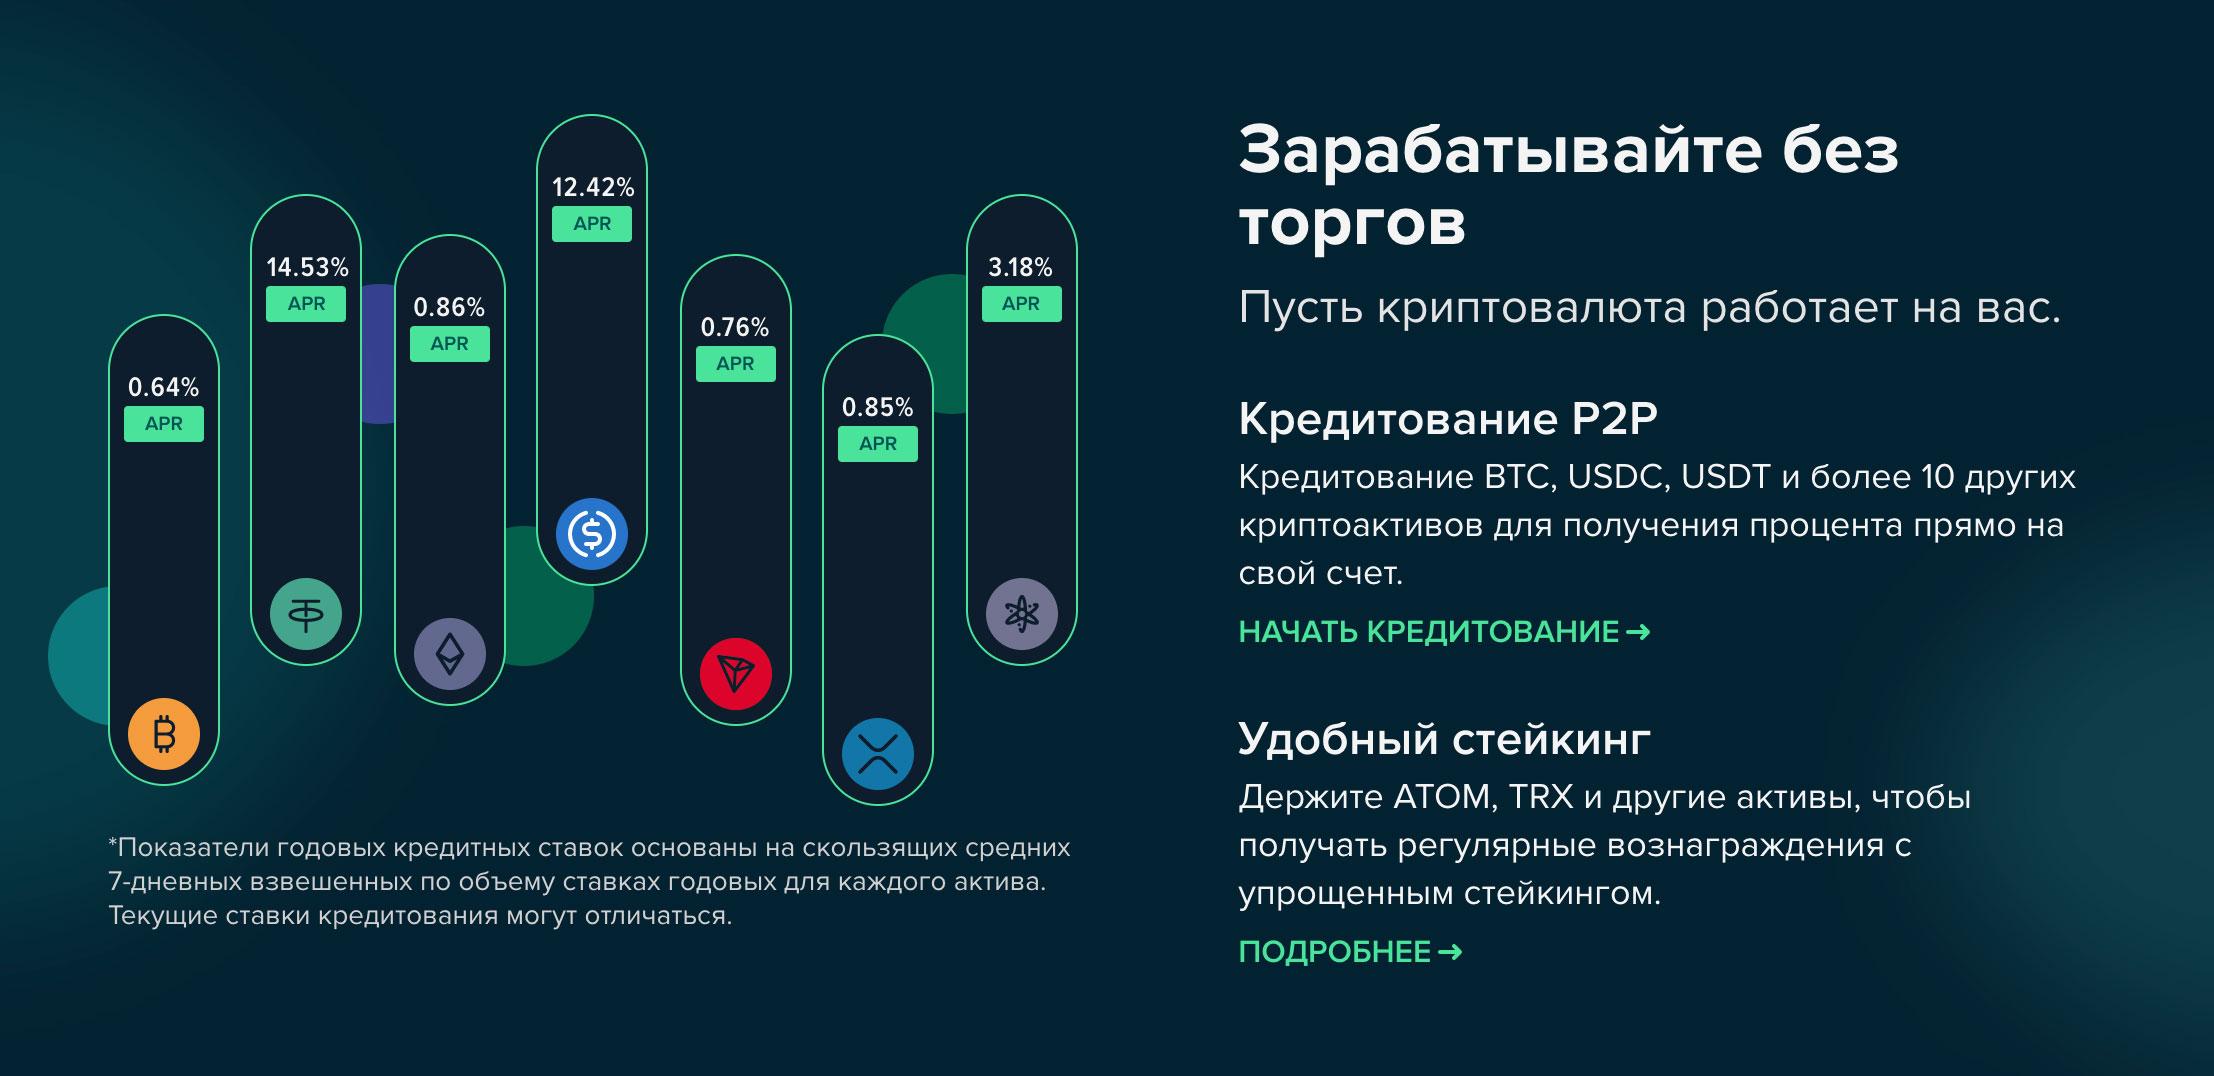 poloniex кредитование p2p